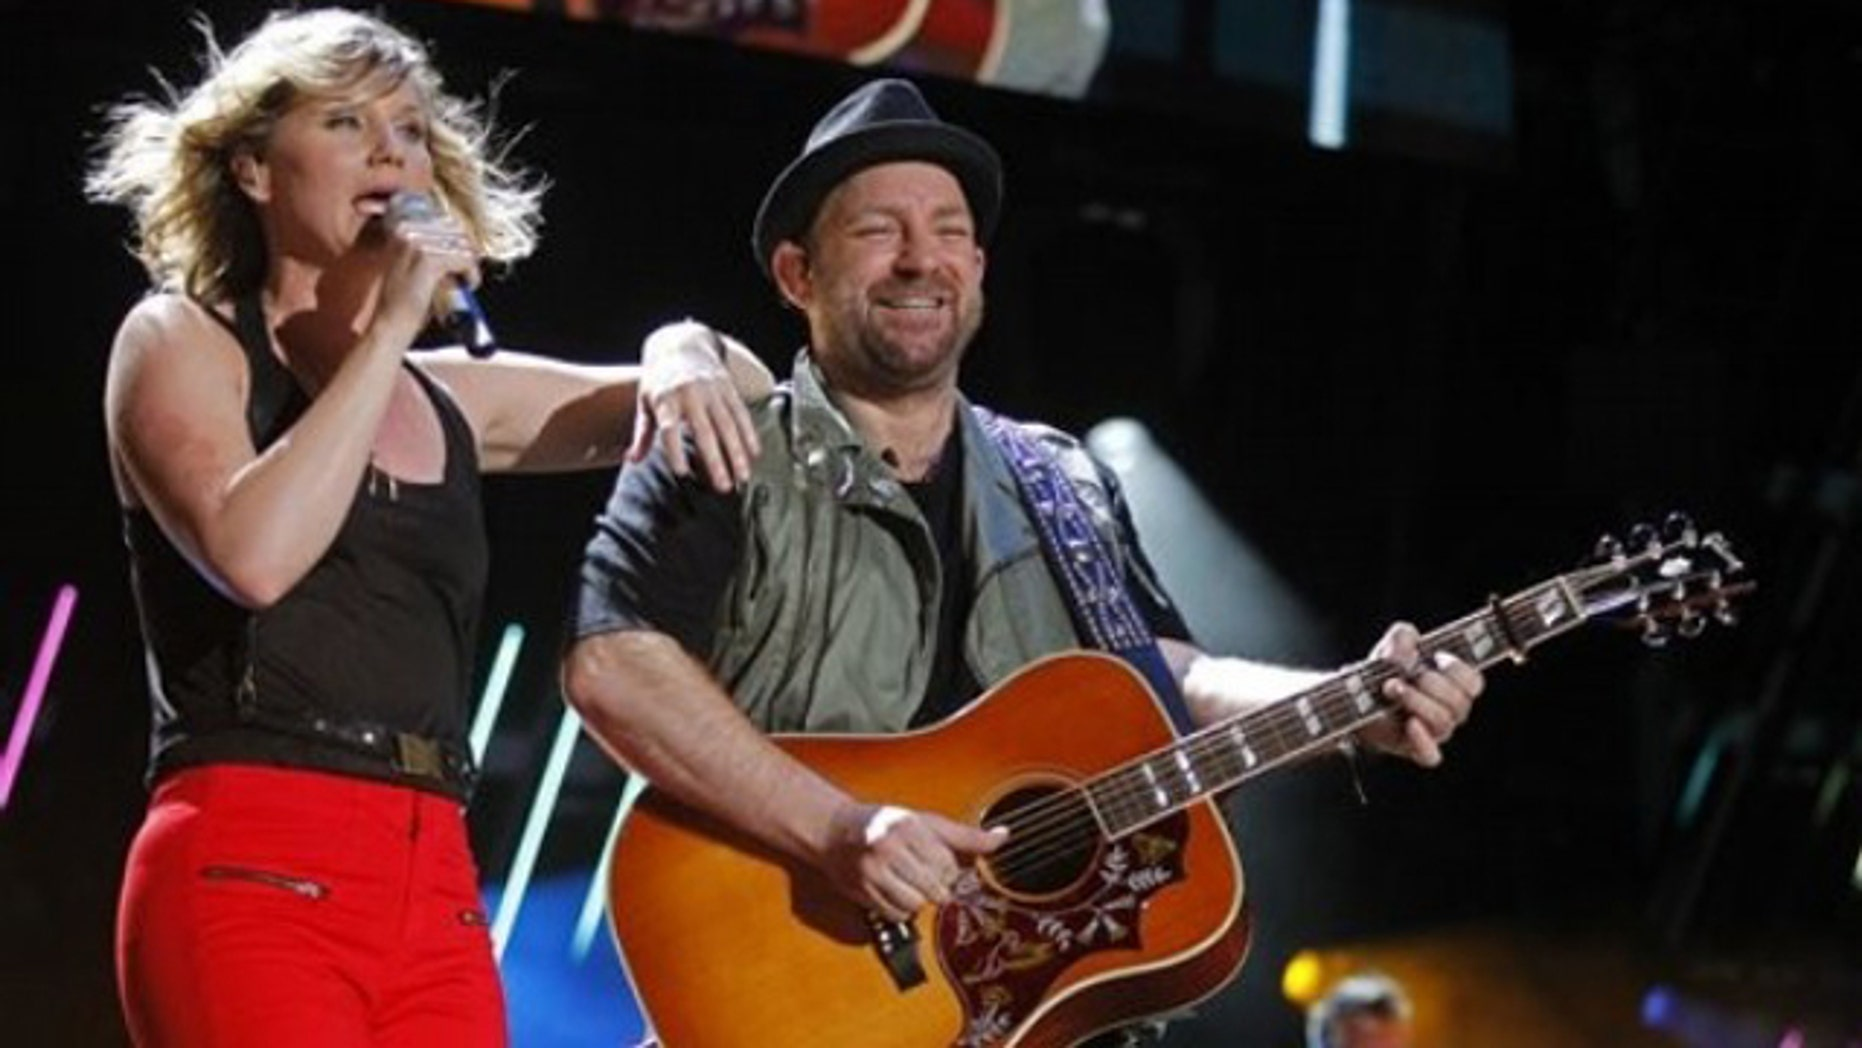 Jennifer Nettles, left, and Christian Bush of Sugarland perform during the CMA Fan Festival Friday, June 10, 2011 in Nashville, Tenn. (AP Photo/Wade Payne)